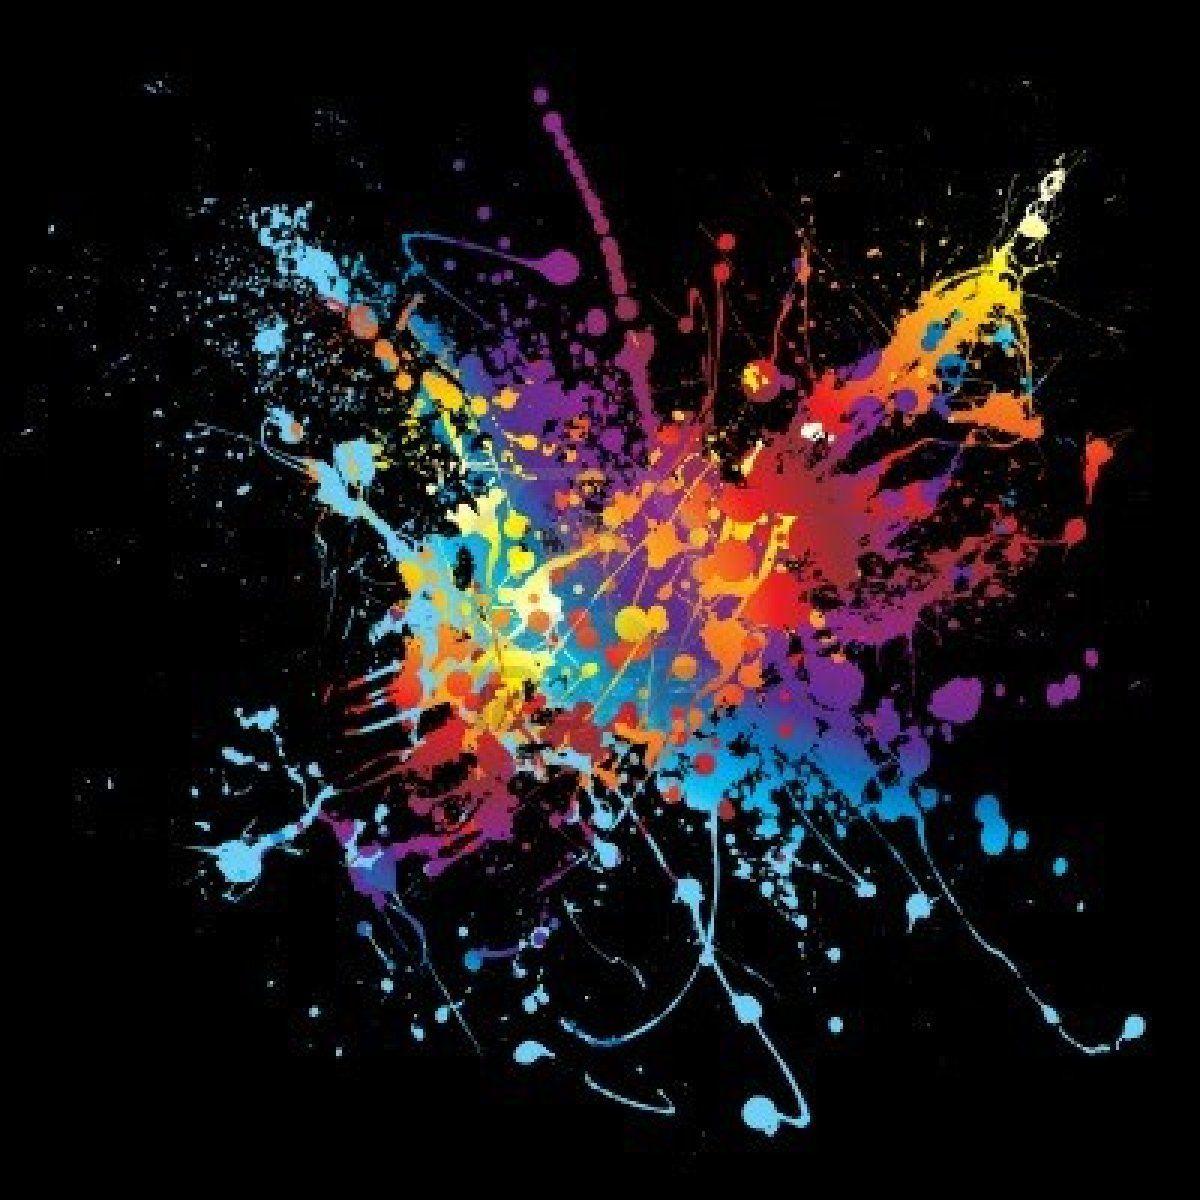 Colourful Splat Design With Black Background Travel